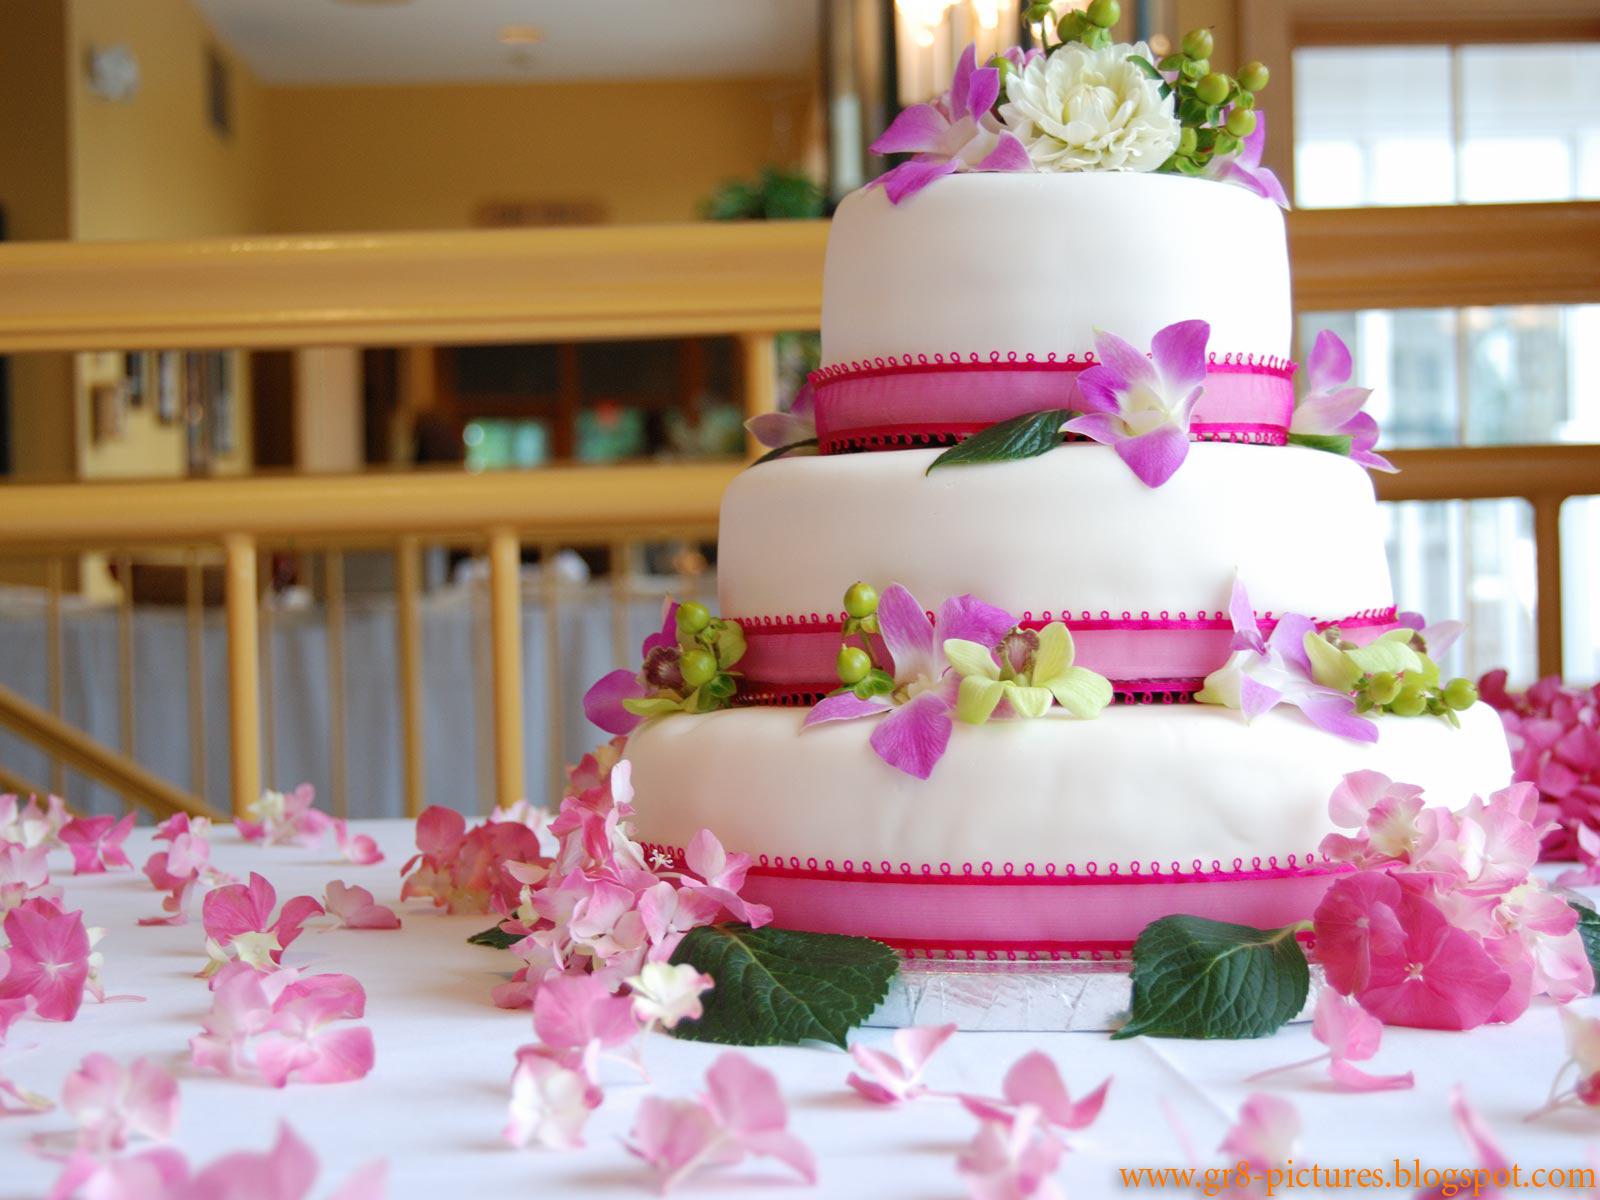 Tremendous 8 Big Y Sheet Birthday Cakes Photo Big Beautiful Wedding Cakes Funny Birthday Cards Online Elaedamsfinfo